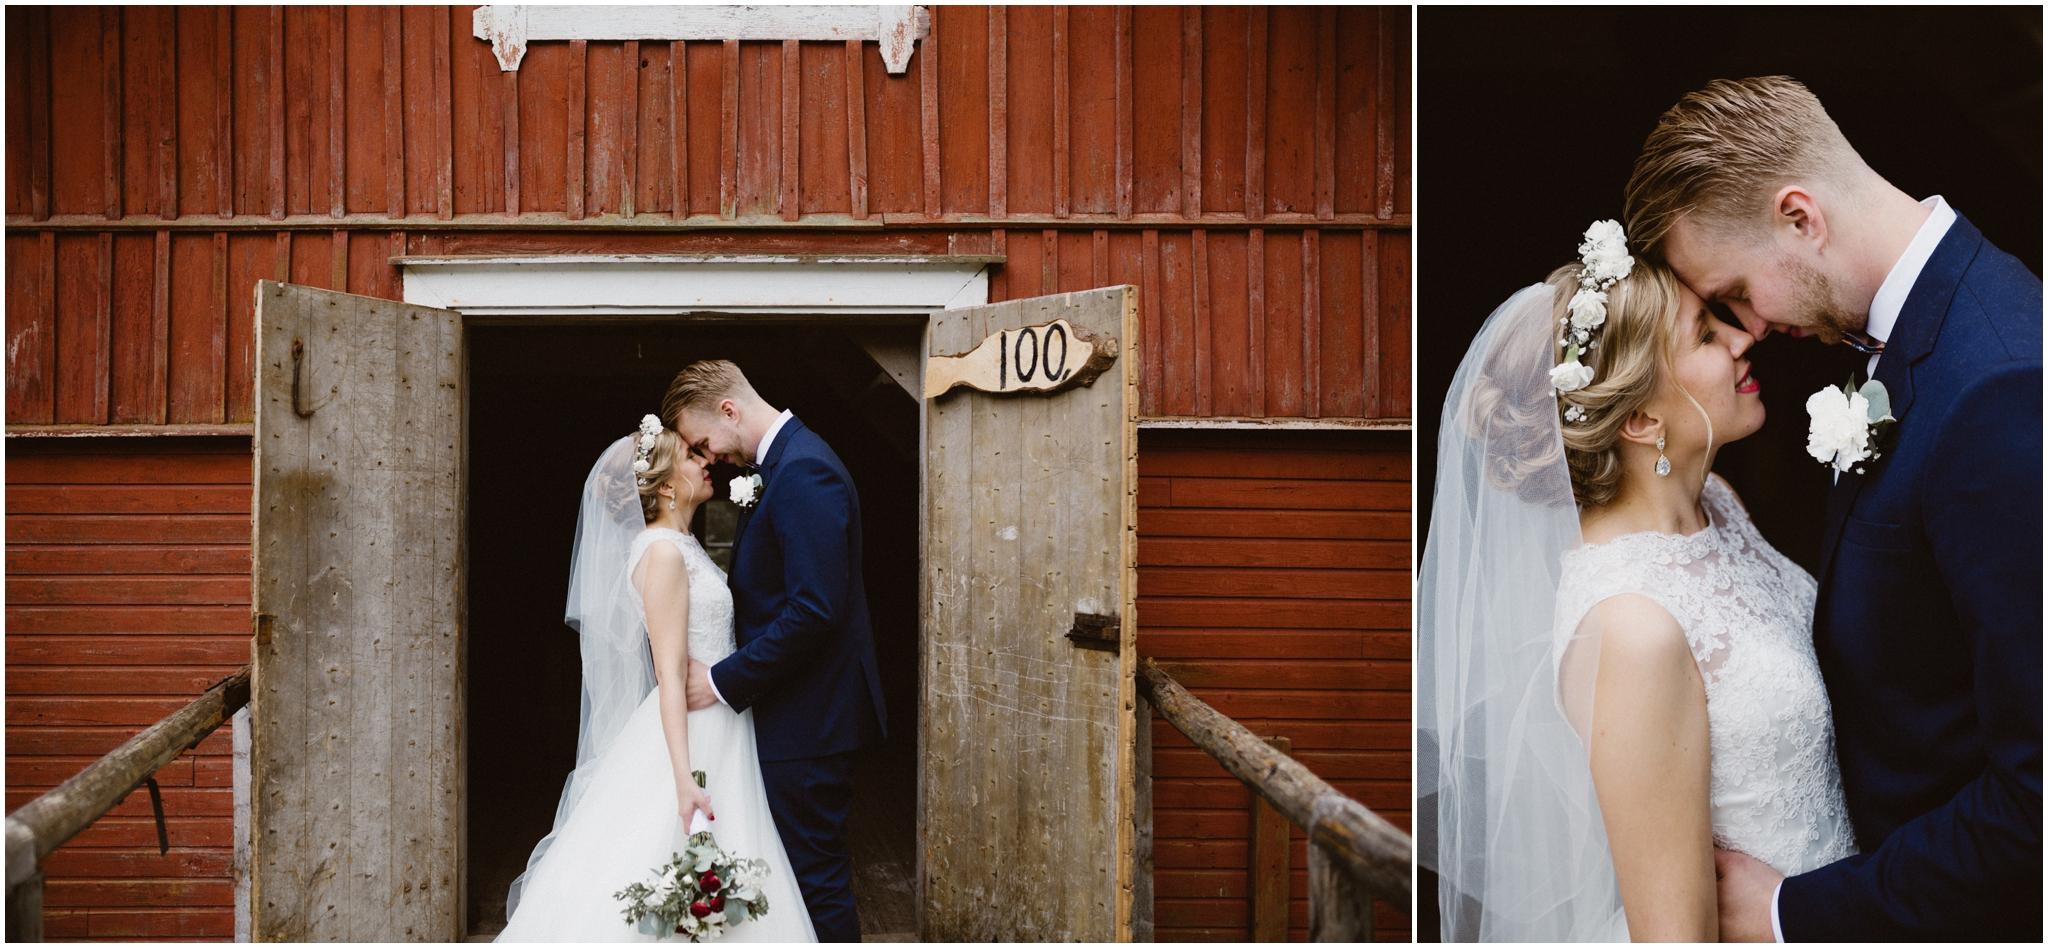 Leevi + Susanna -- Patrick Karkkolainen Wedding Photographer + Adventurer-95.jpg